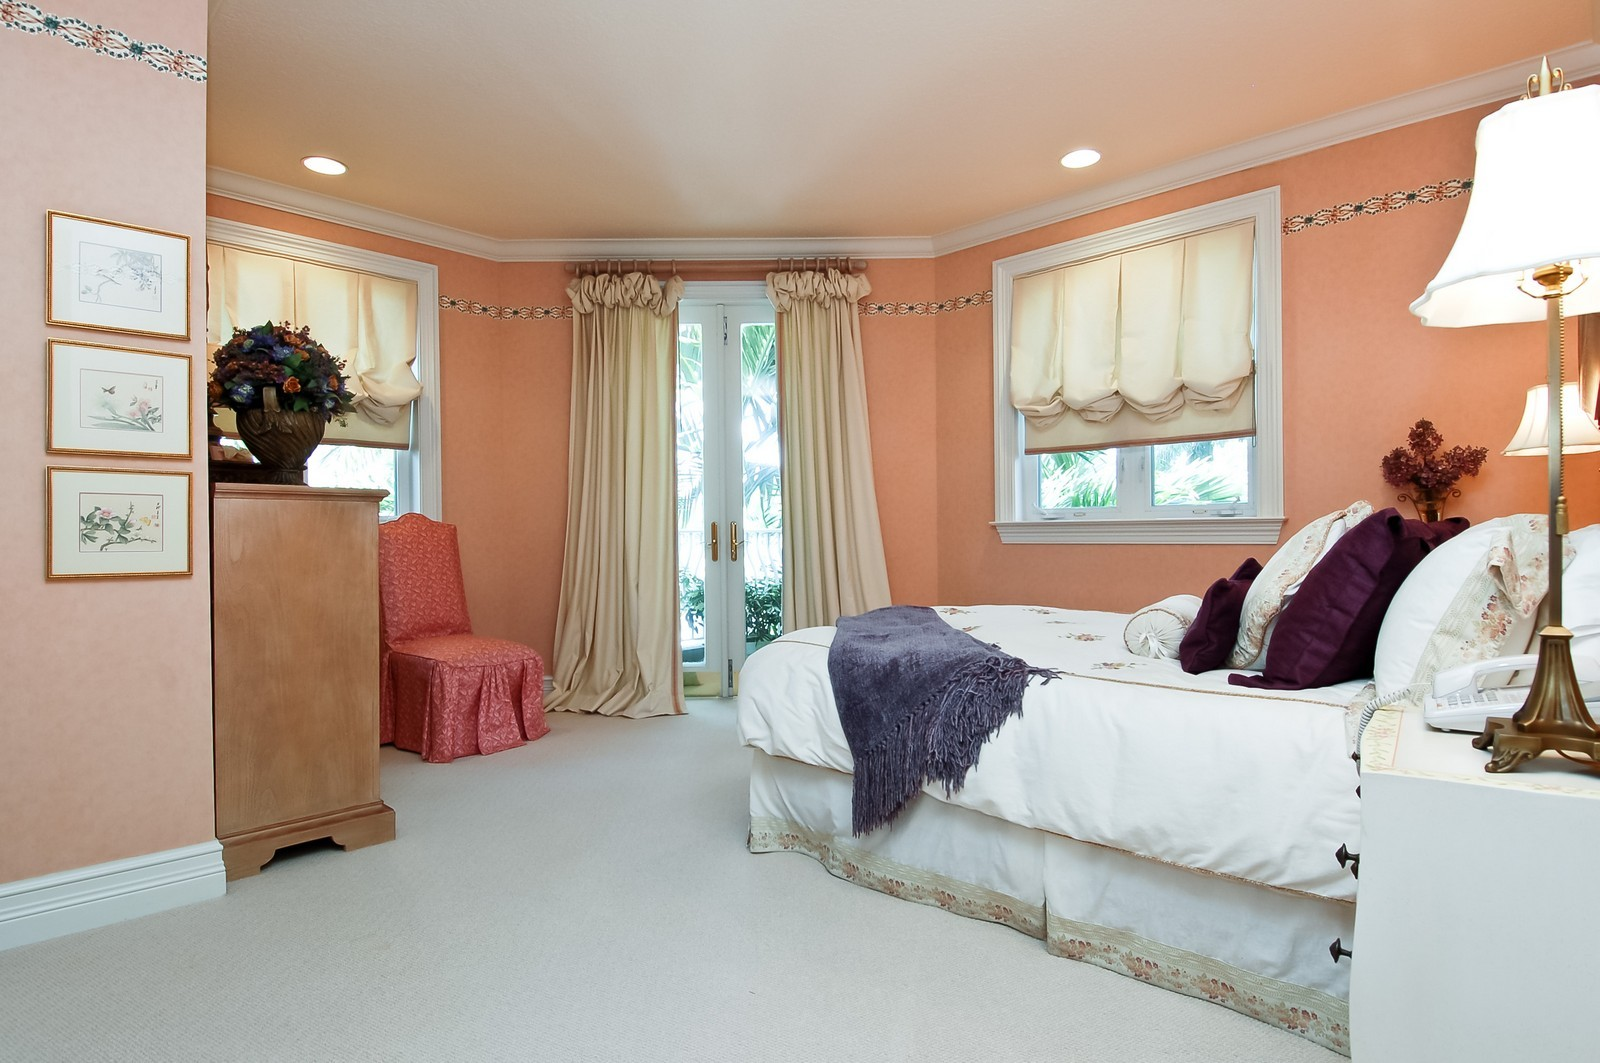 Real Estate Photography - 19674 OakbrookCourt, Boca Raton, FL, 33434 - 2nd Bedroom